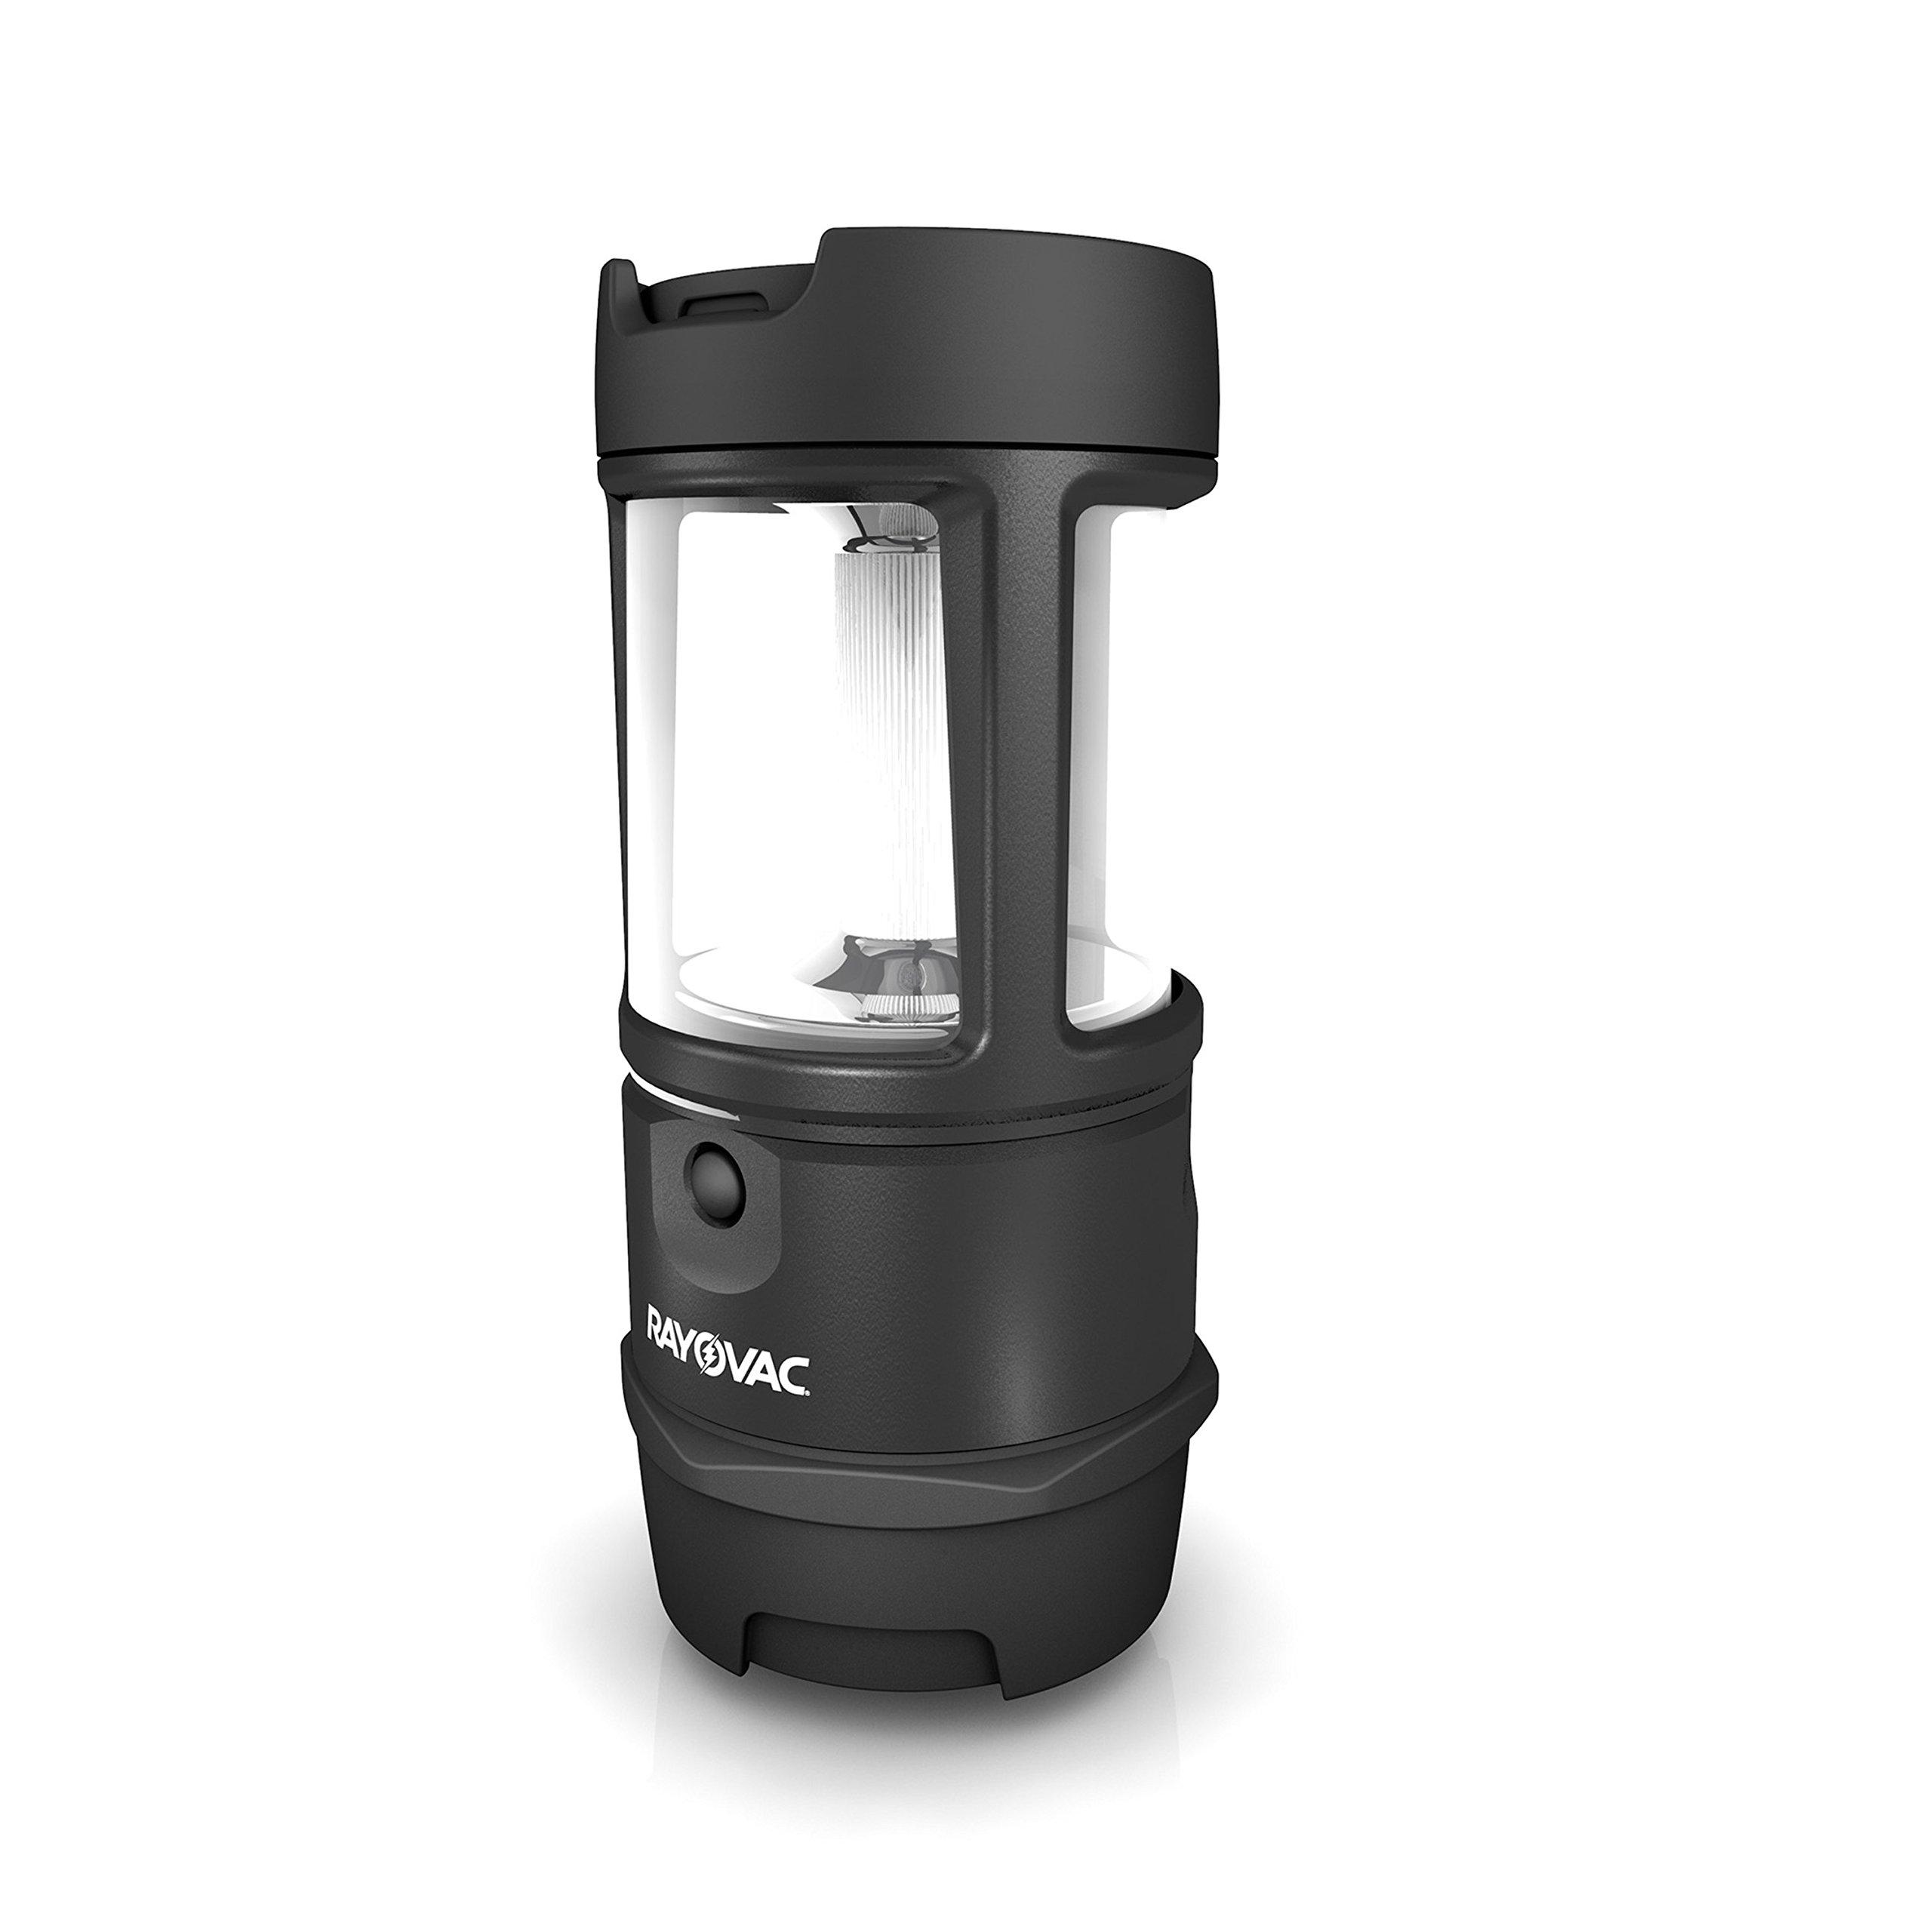 RAYOVAC 3D LED Indestructible Lantern with Battery, DIYLN3D-BA